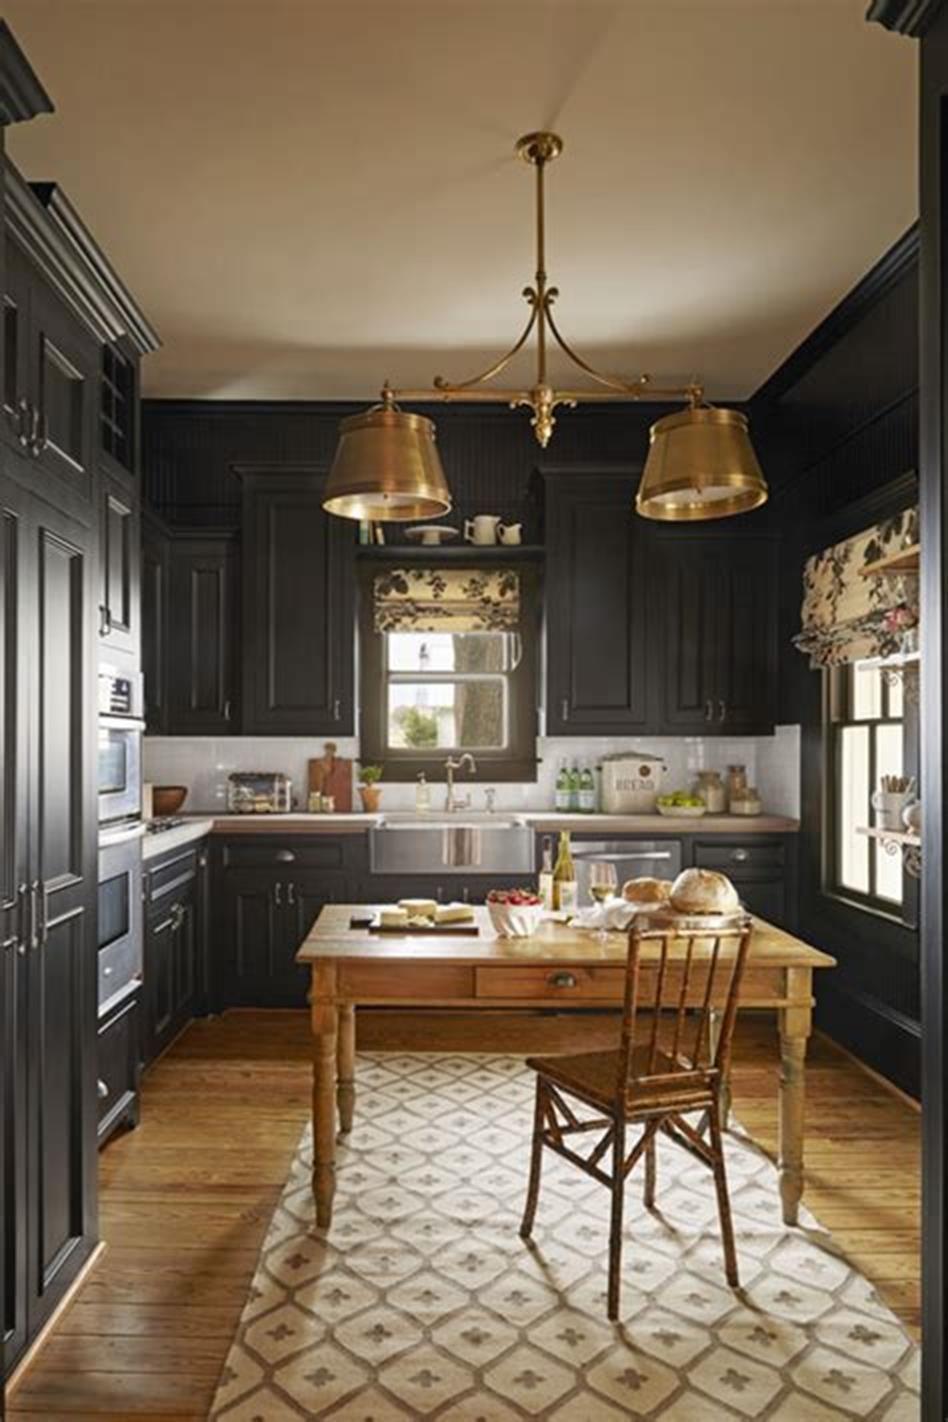 37 inspiring country kitchen decorating ideas farmhouse